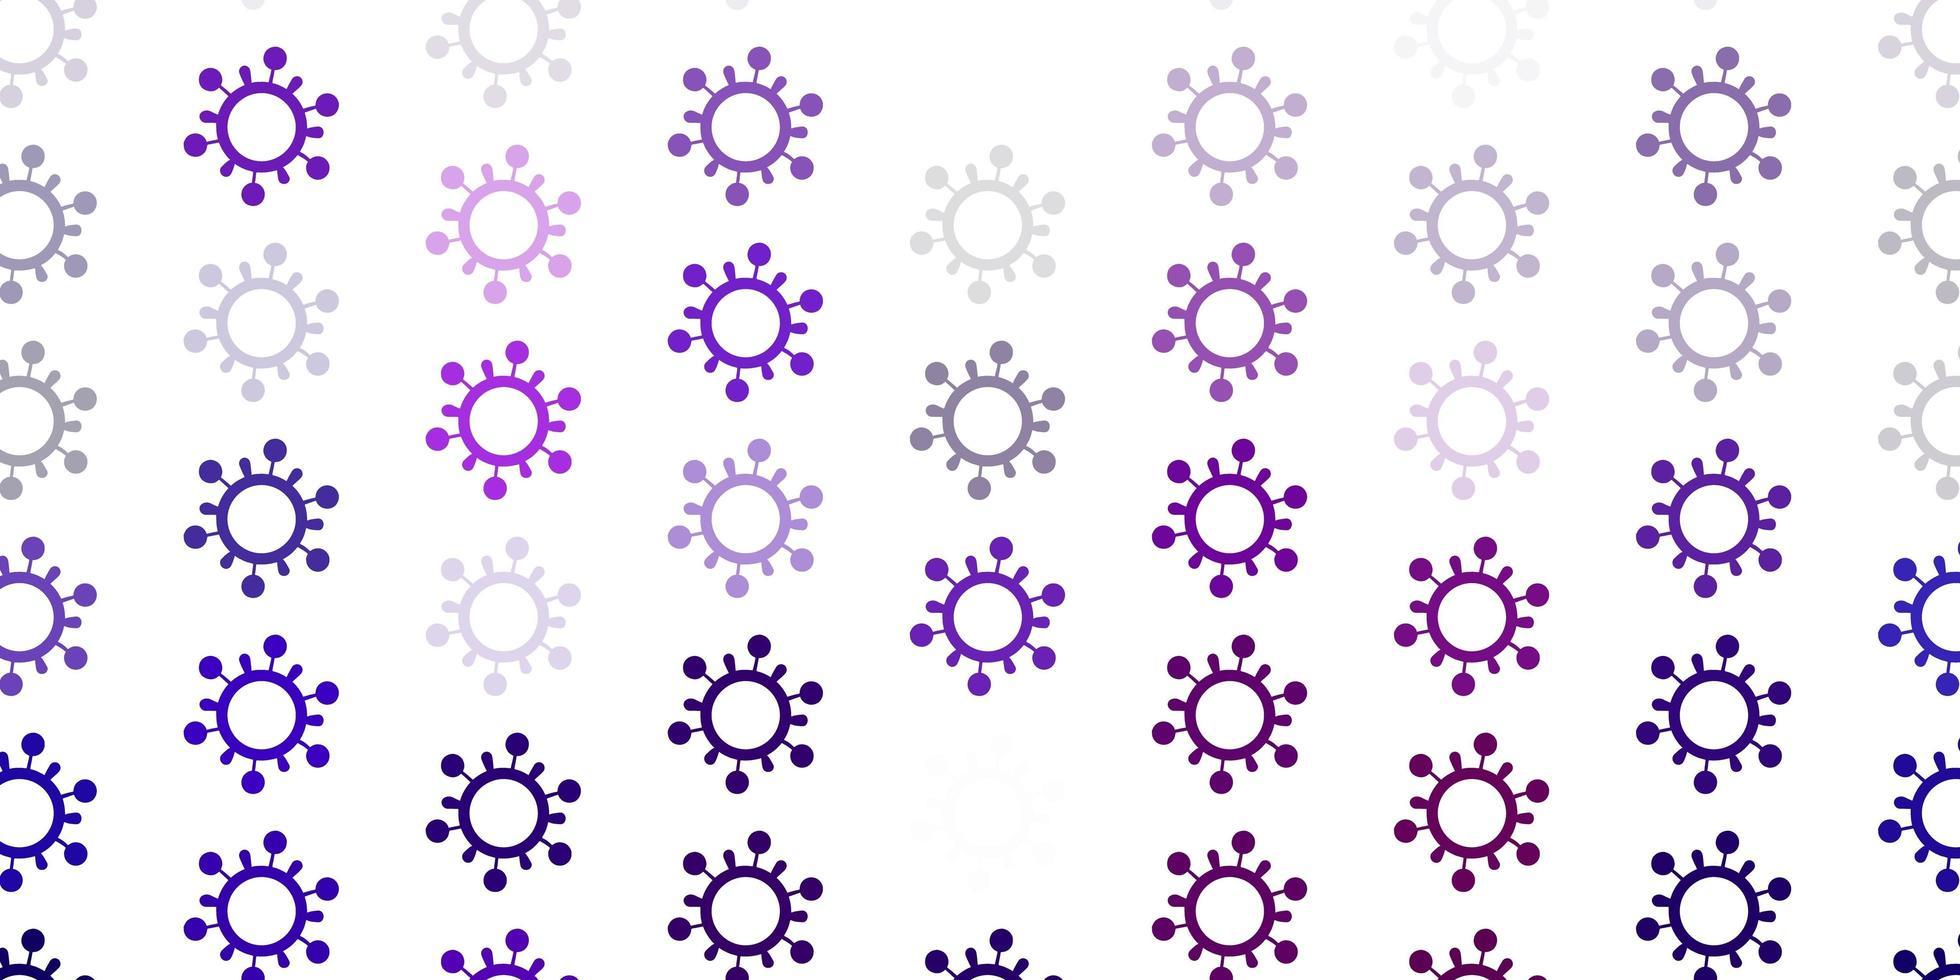 hellviolettes Vektormuster mit Coronavirus-Elementen vektor